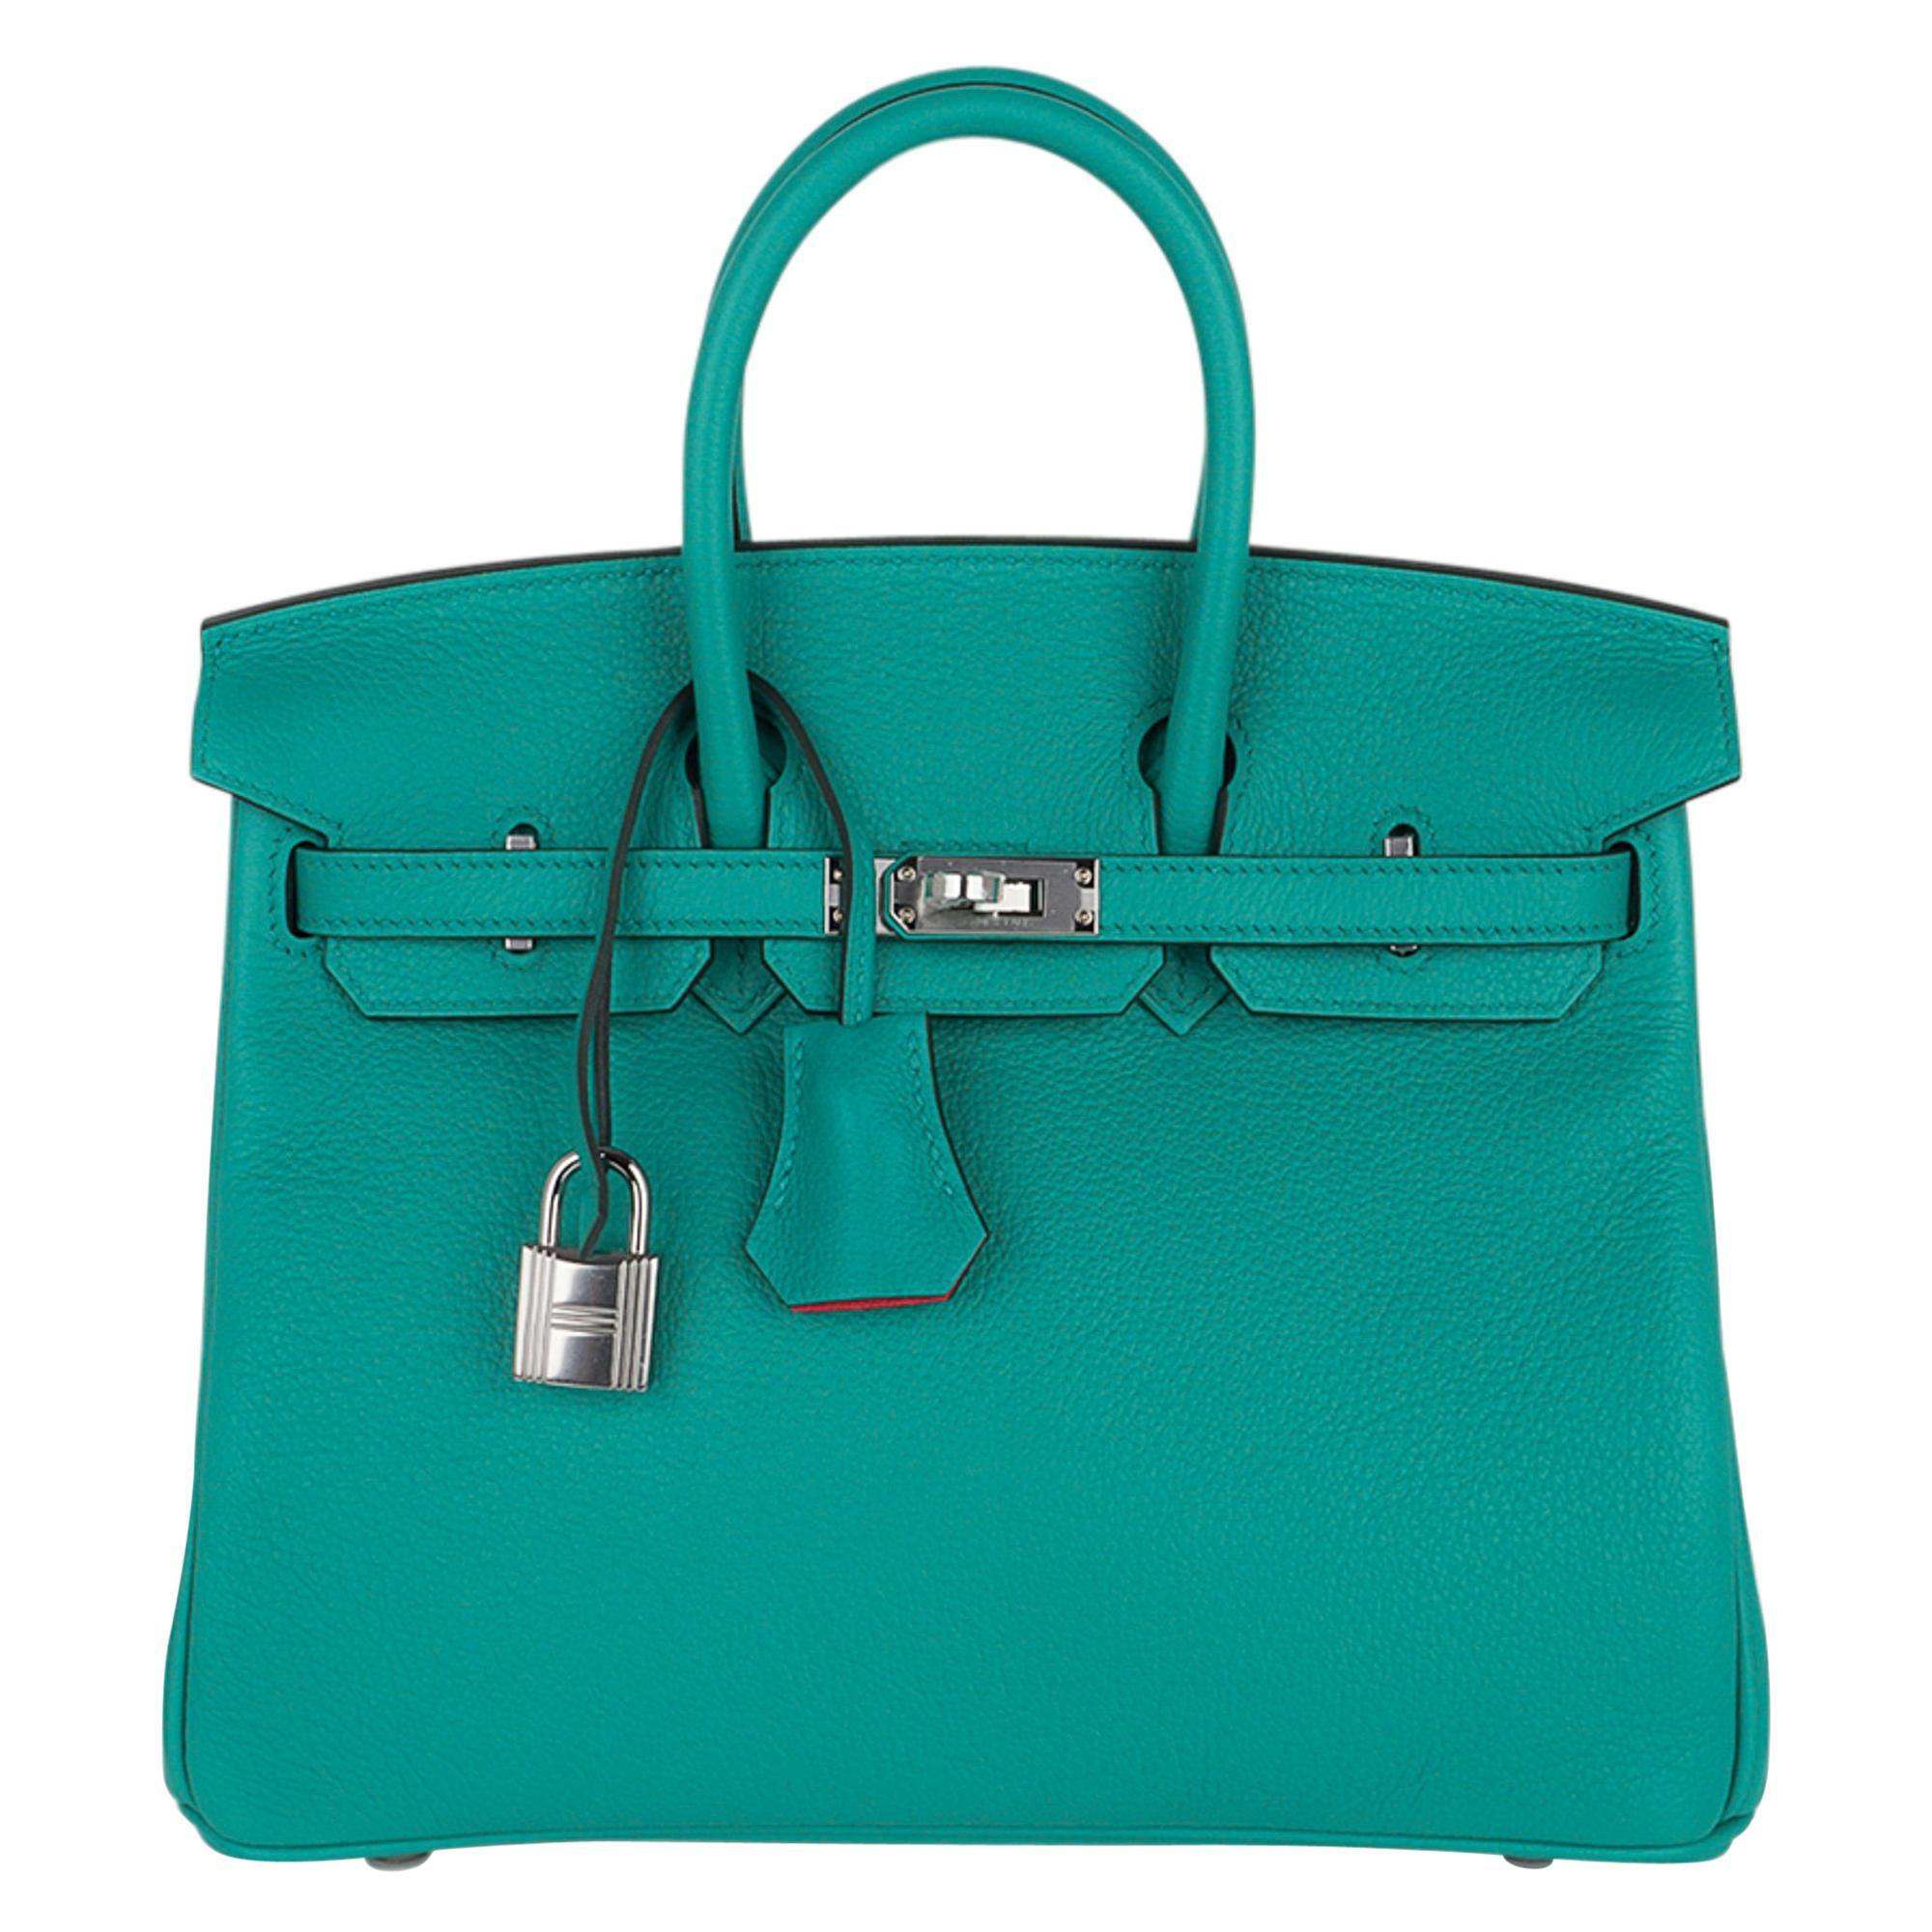 Hermes Birkin 25 Bag Verso Vert Verone/Rose Lipstick Novillo Leather New w/Box